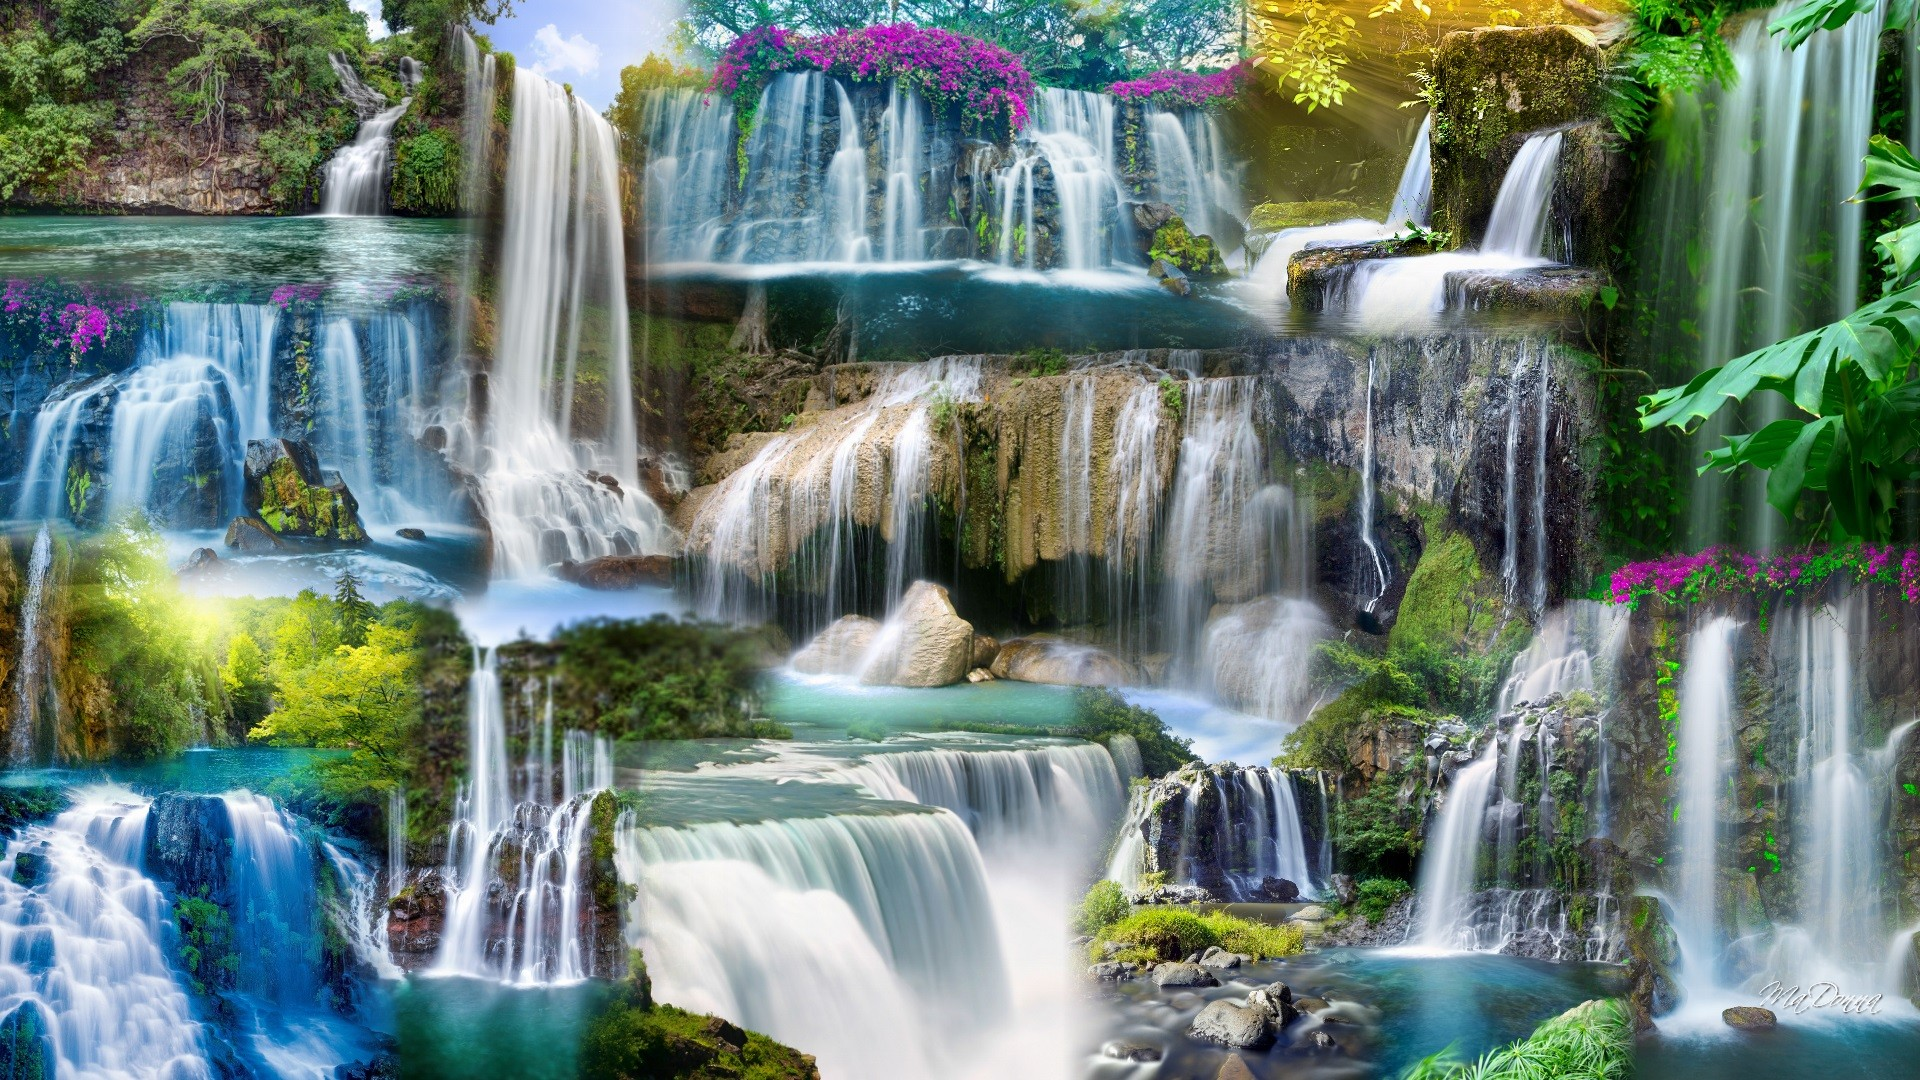 Niagara Water Falls Desktop Wallpaper Waterfall Wallpapers High Quality Download Free